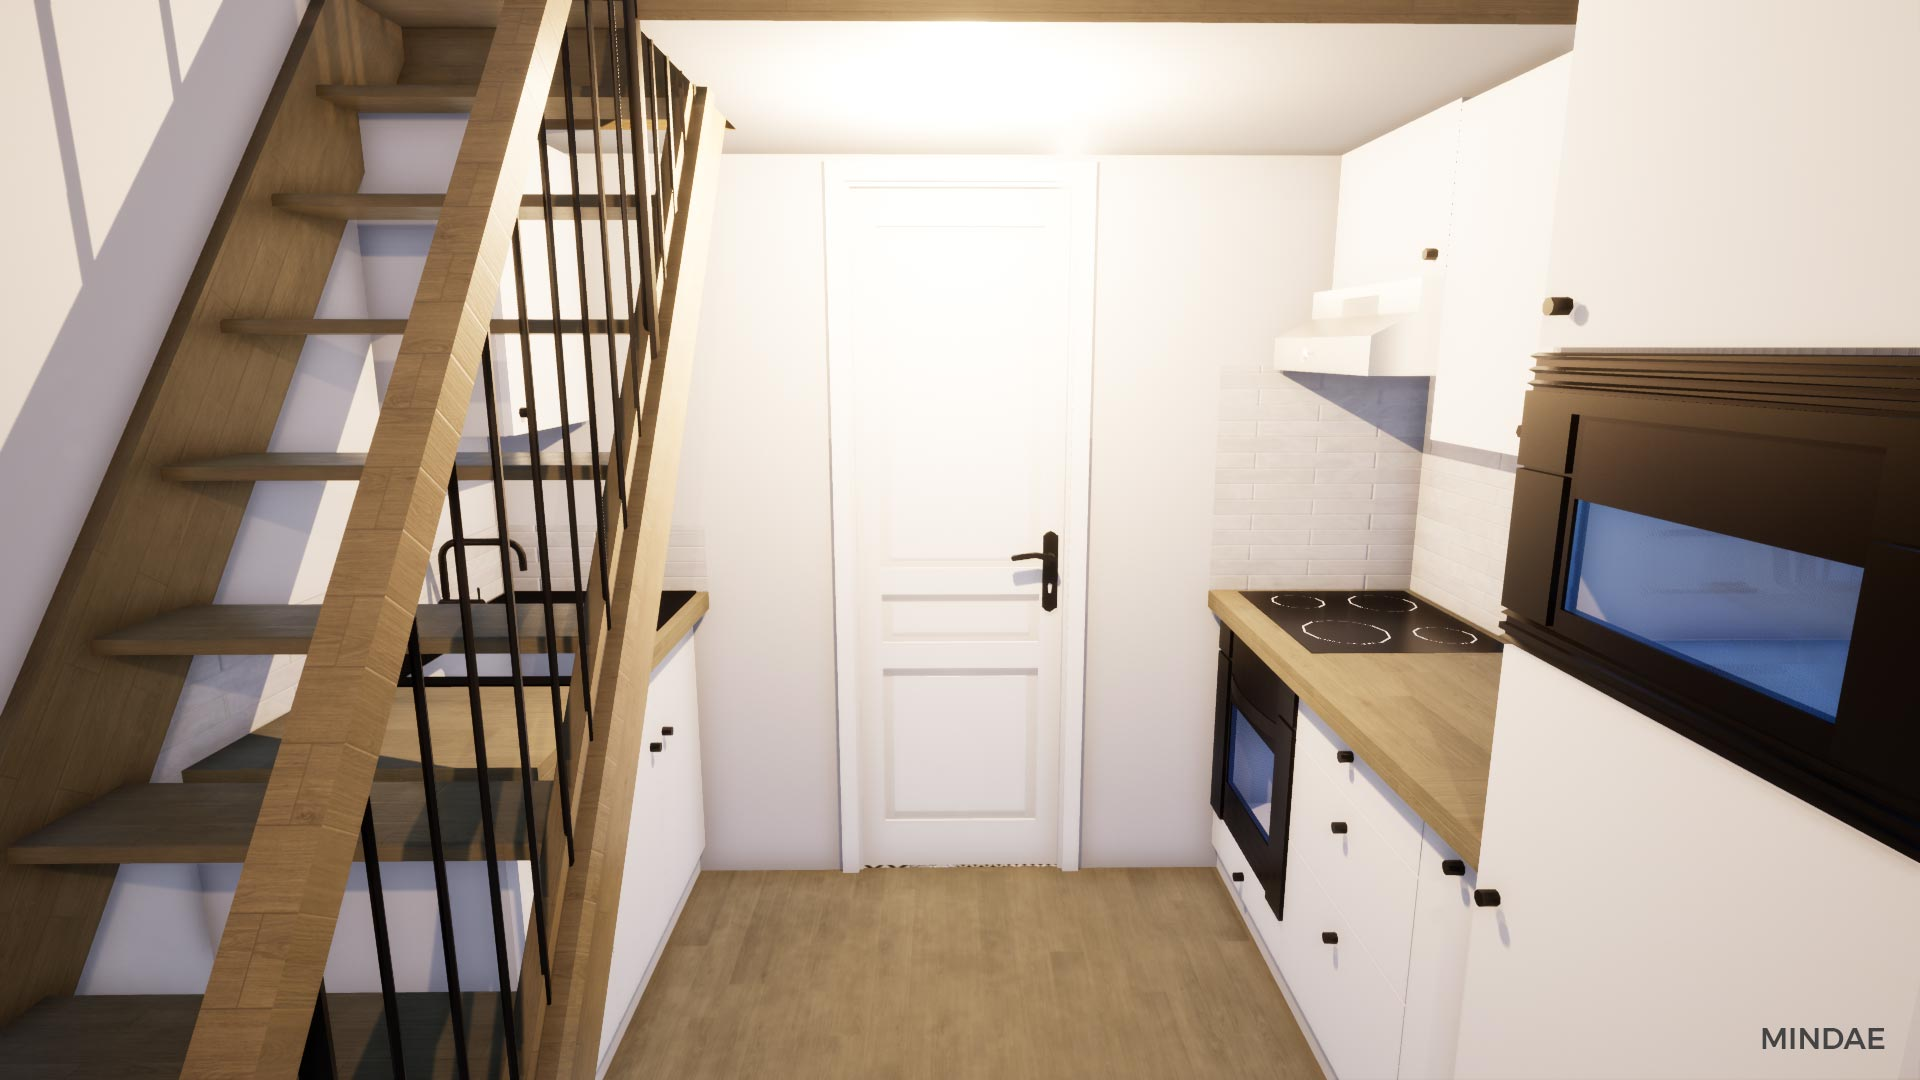 Mindae_3D_as_immobilier_projet_A_garage_duplex_studio_investisseur_caen-(3)